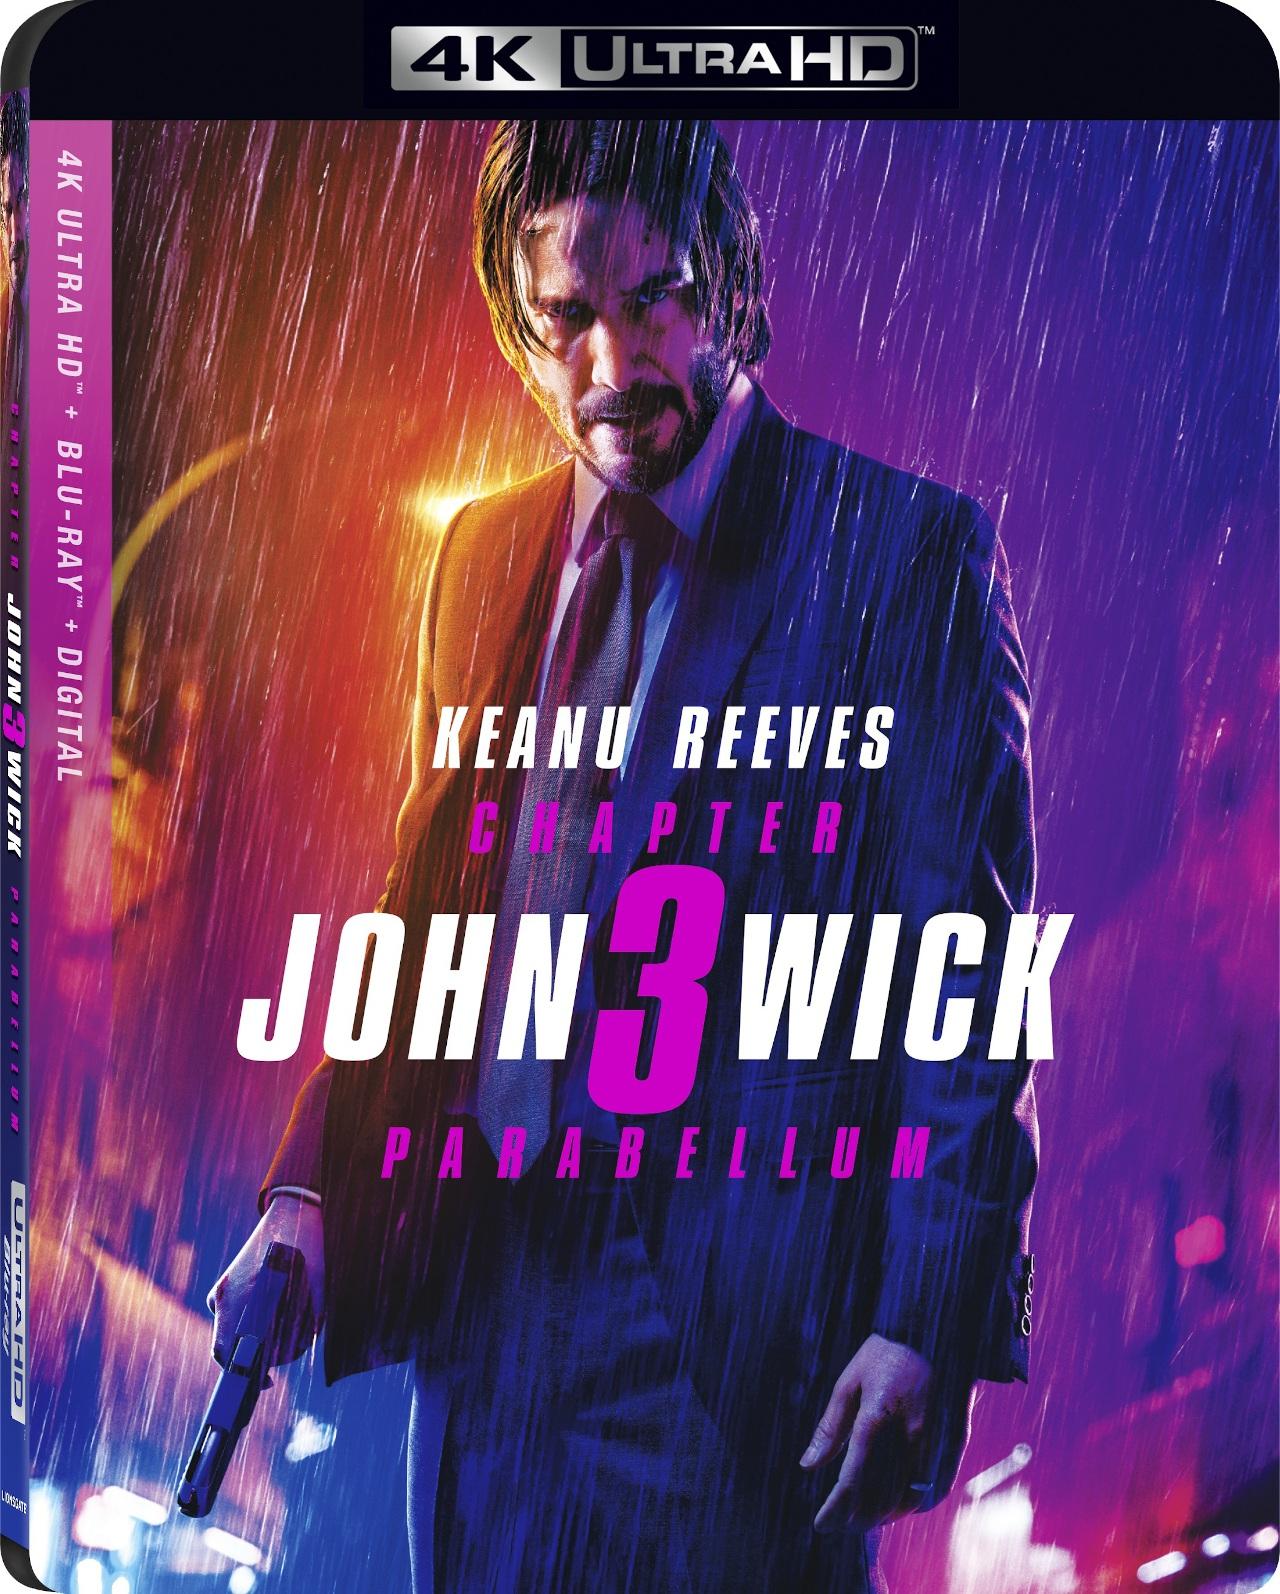 John Wick 3 4K UHD - Best 4K Blu-ray Action Movies